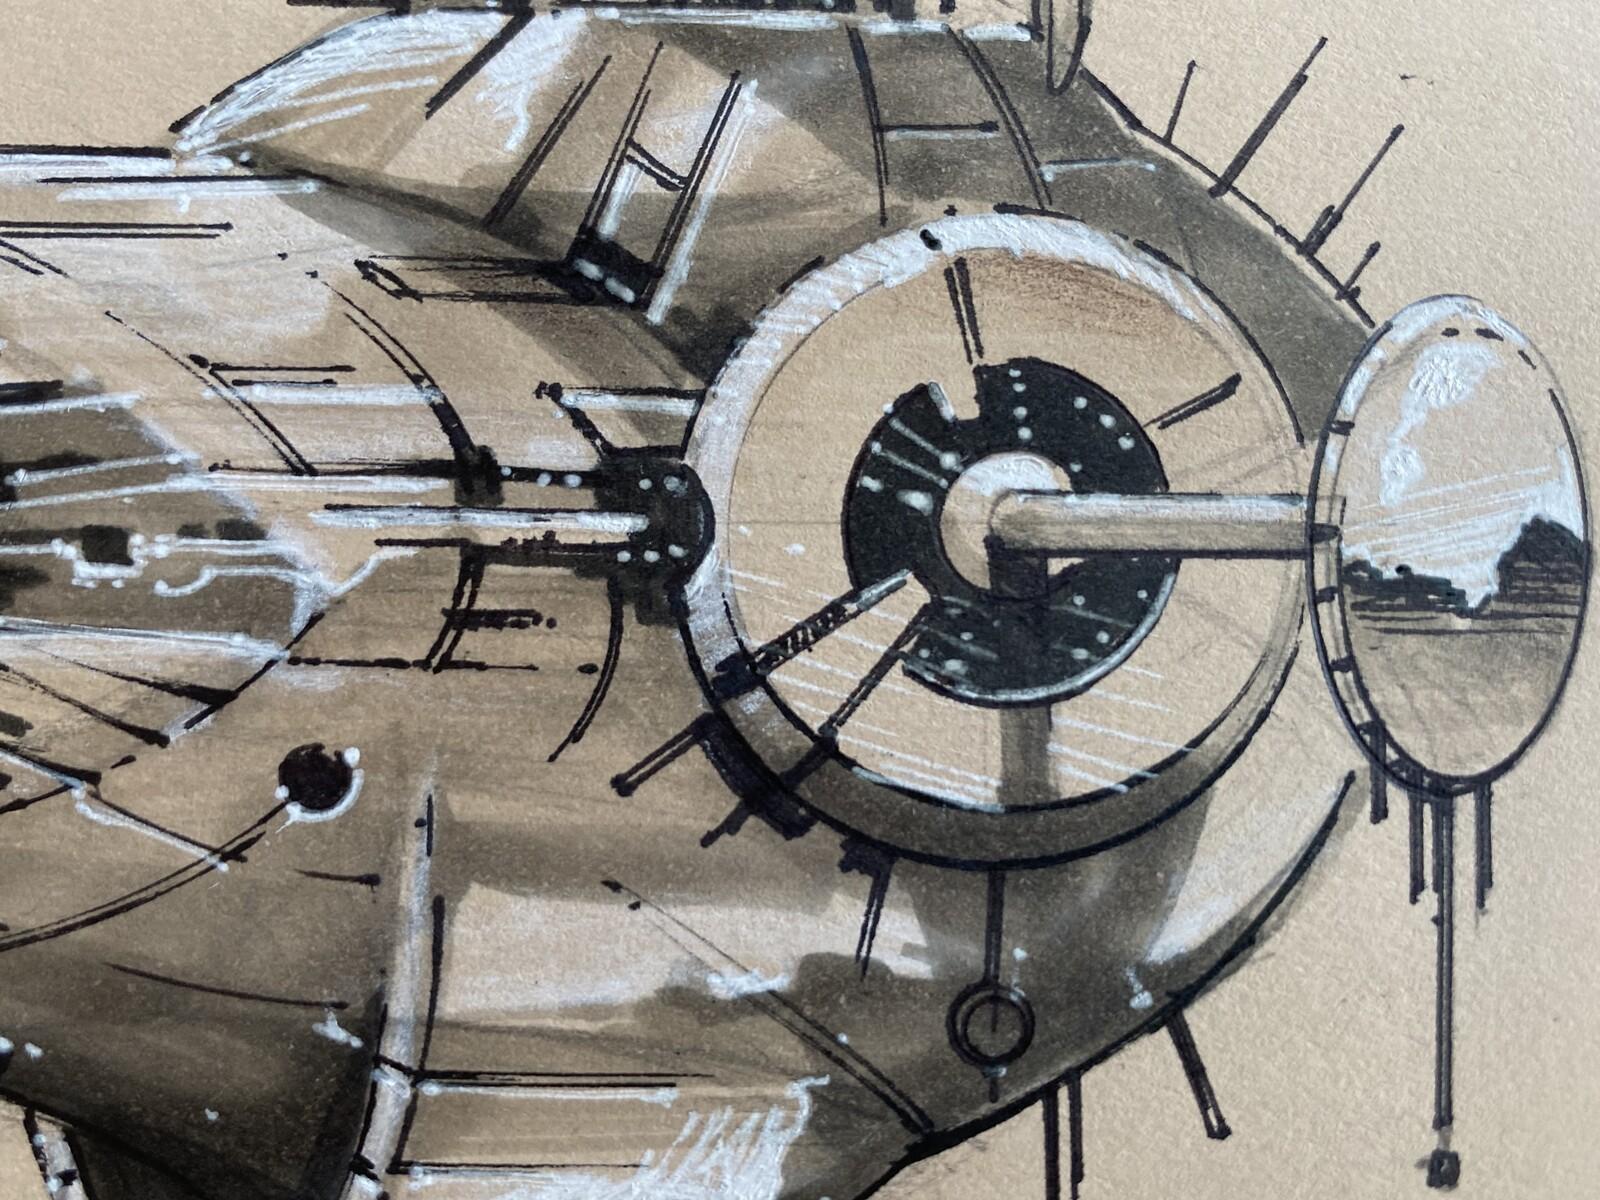 Starship concept practice